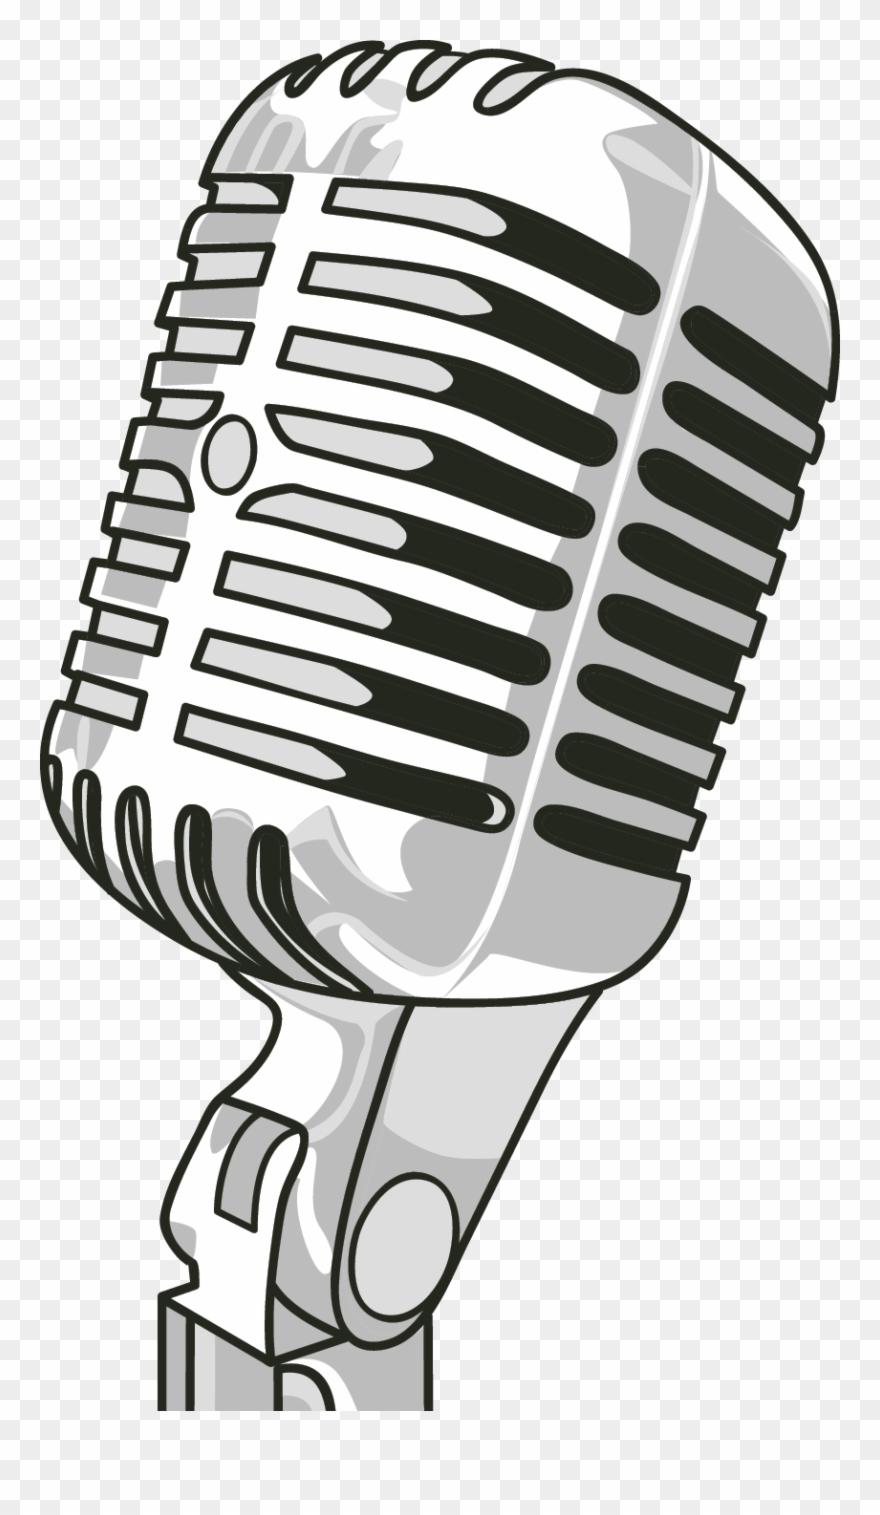 Microhpne clipart transparent download Radio Microphone Clip Art - Poster Background Splash Of Color ... transparent download